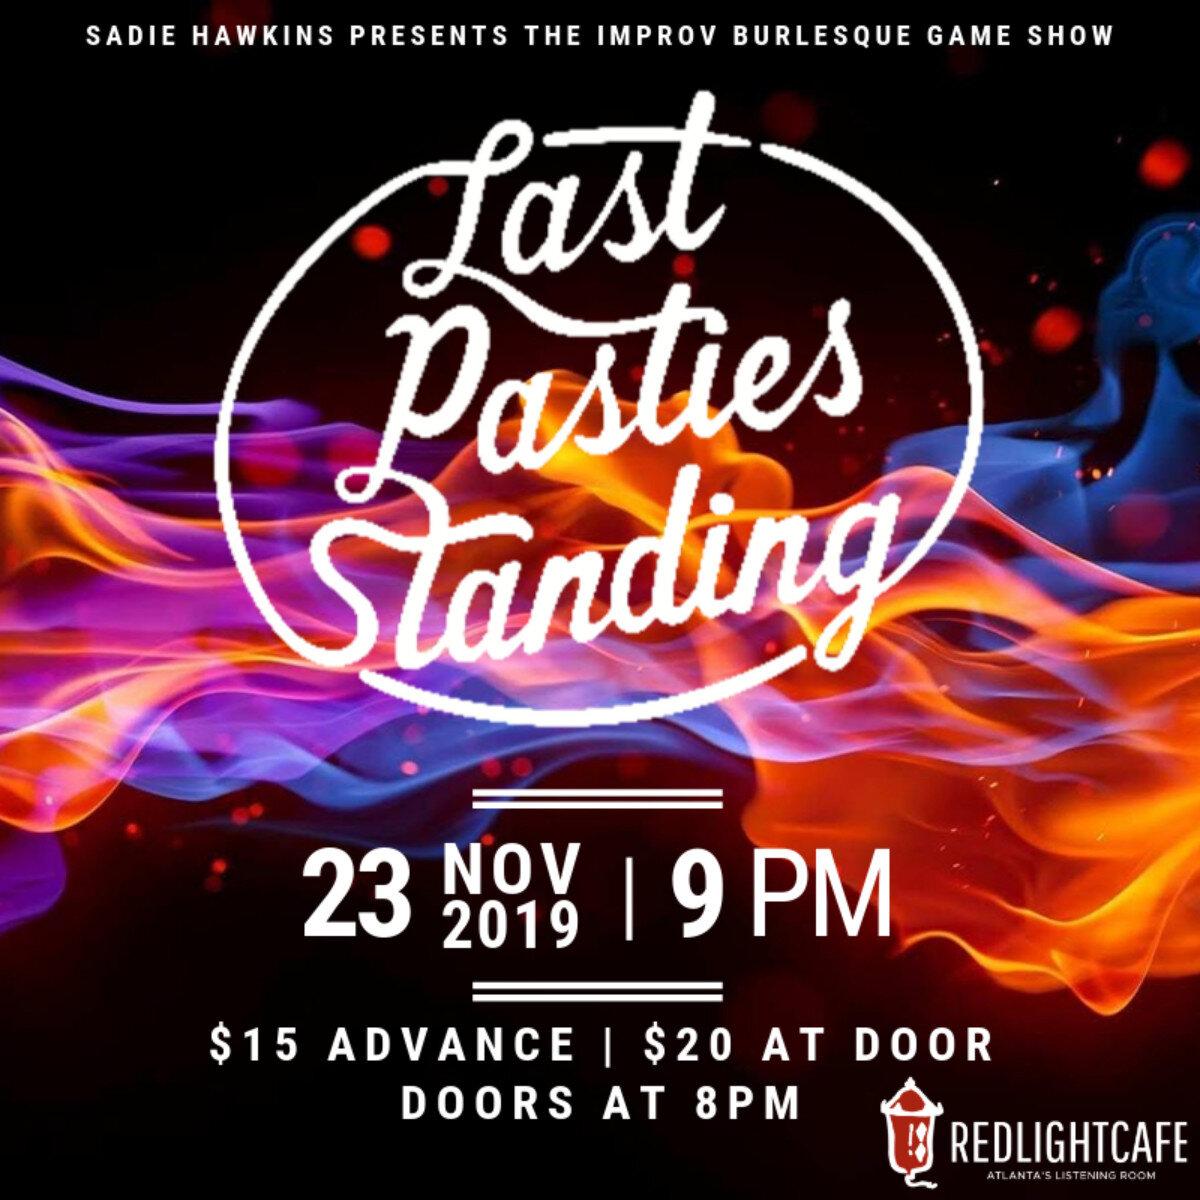 Last Pasties Standing (The Improv Burlesque Game Show): Jock Jams! — November 23, 2019 — Red Light Café, Atlanta, GA